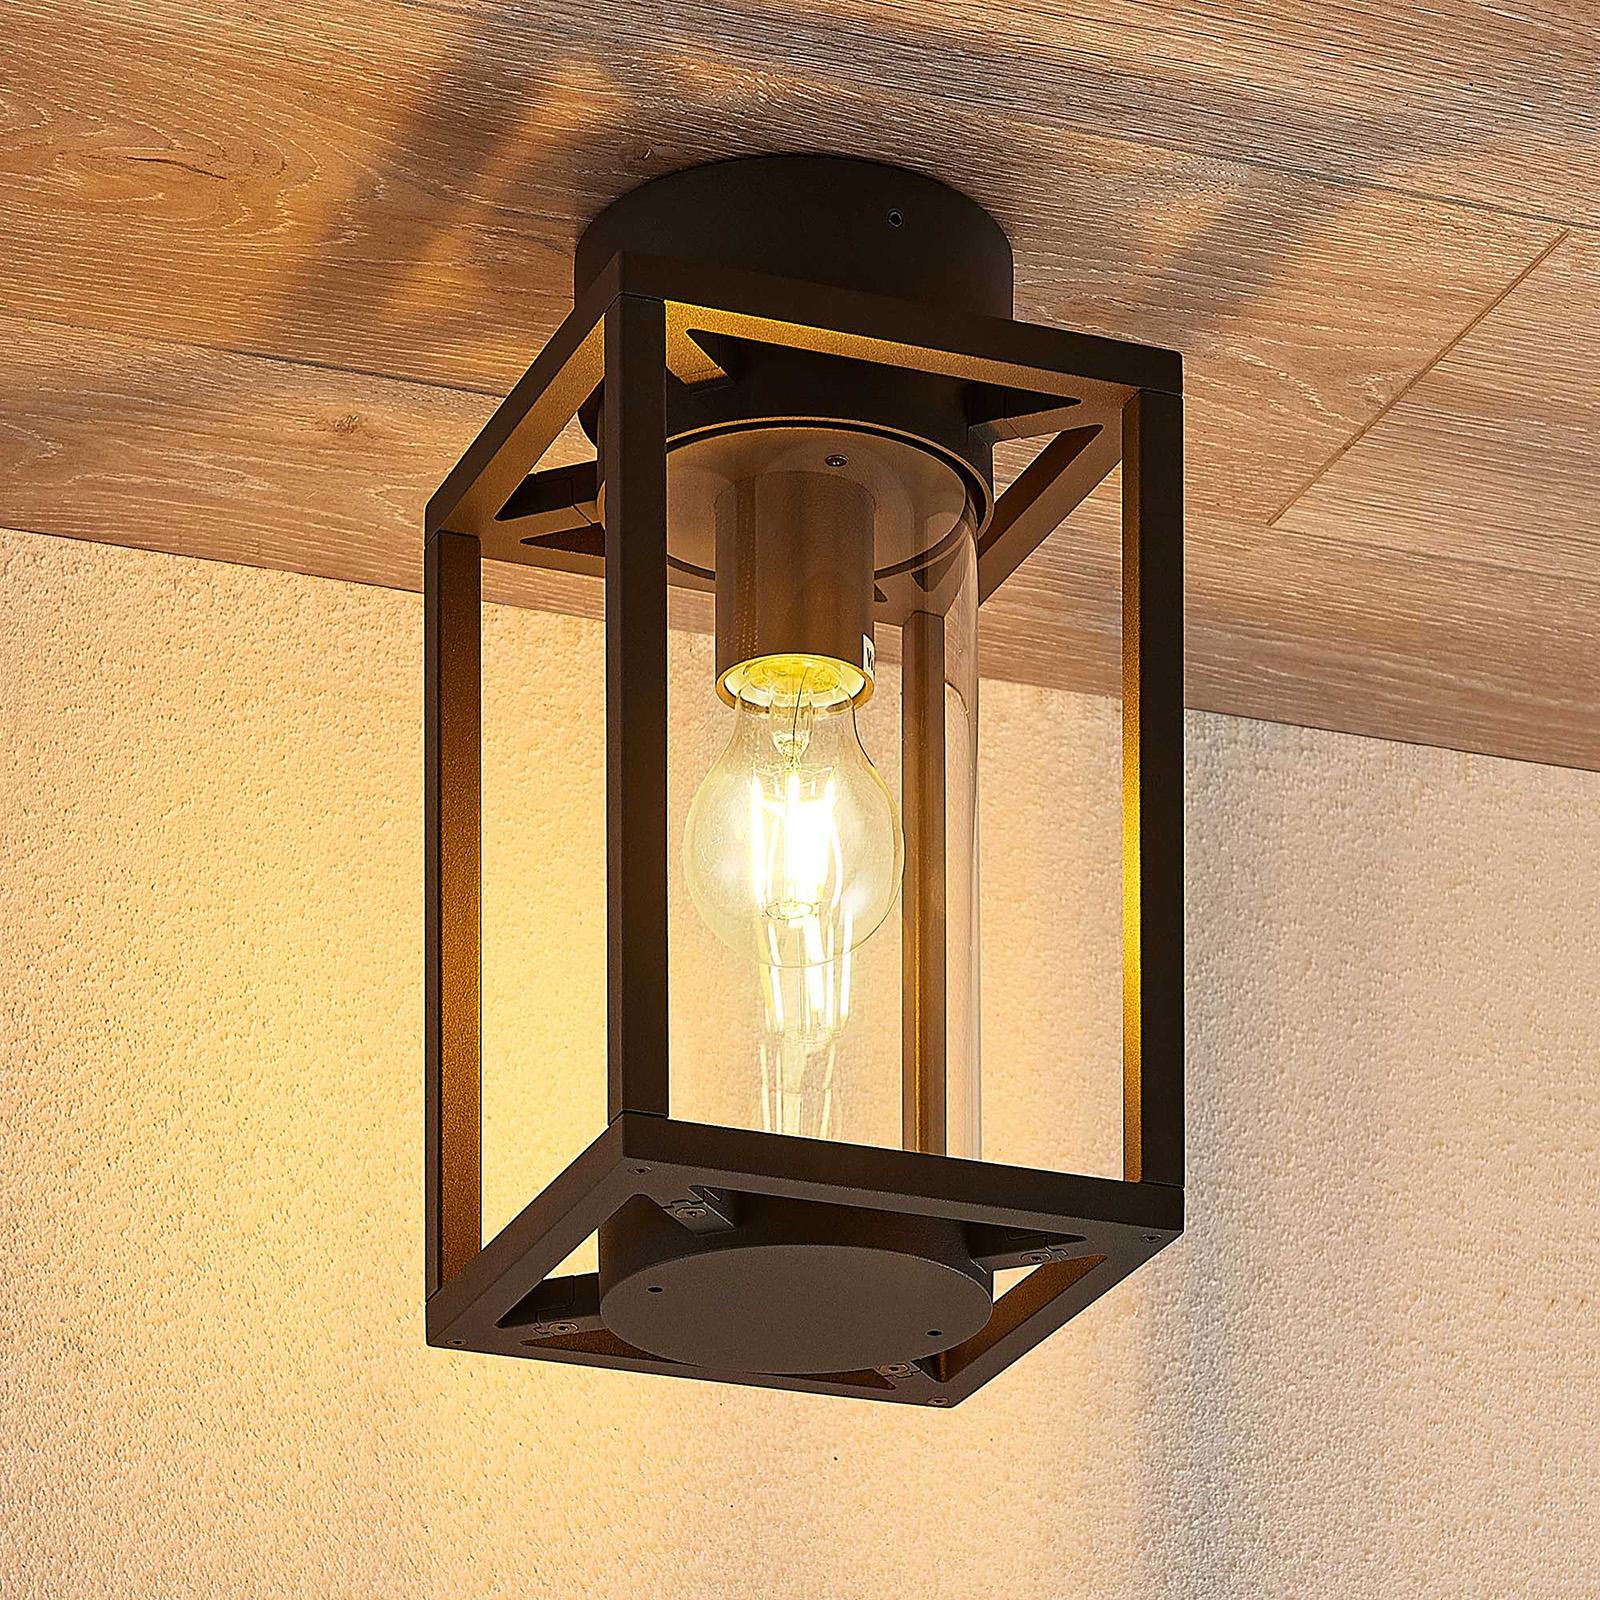 Lucande Ferda taklampe til uteområdet